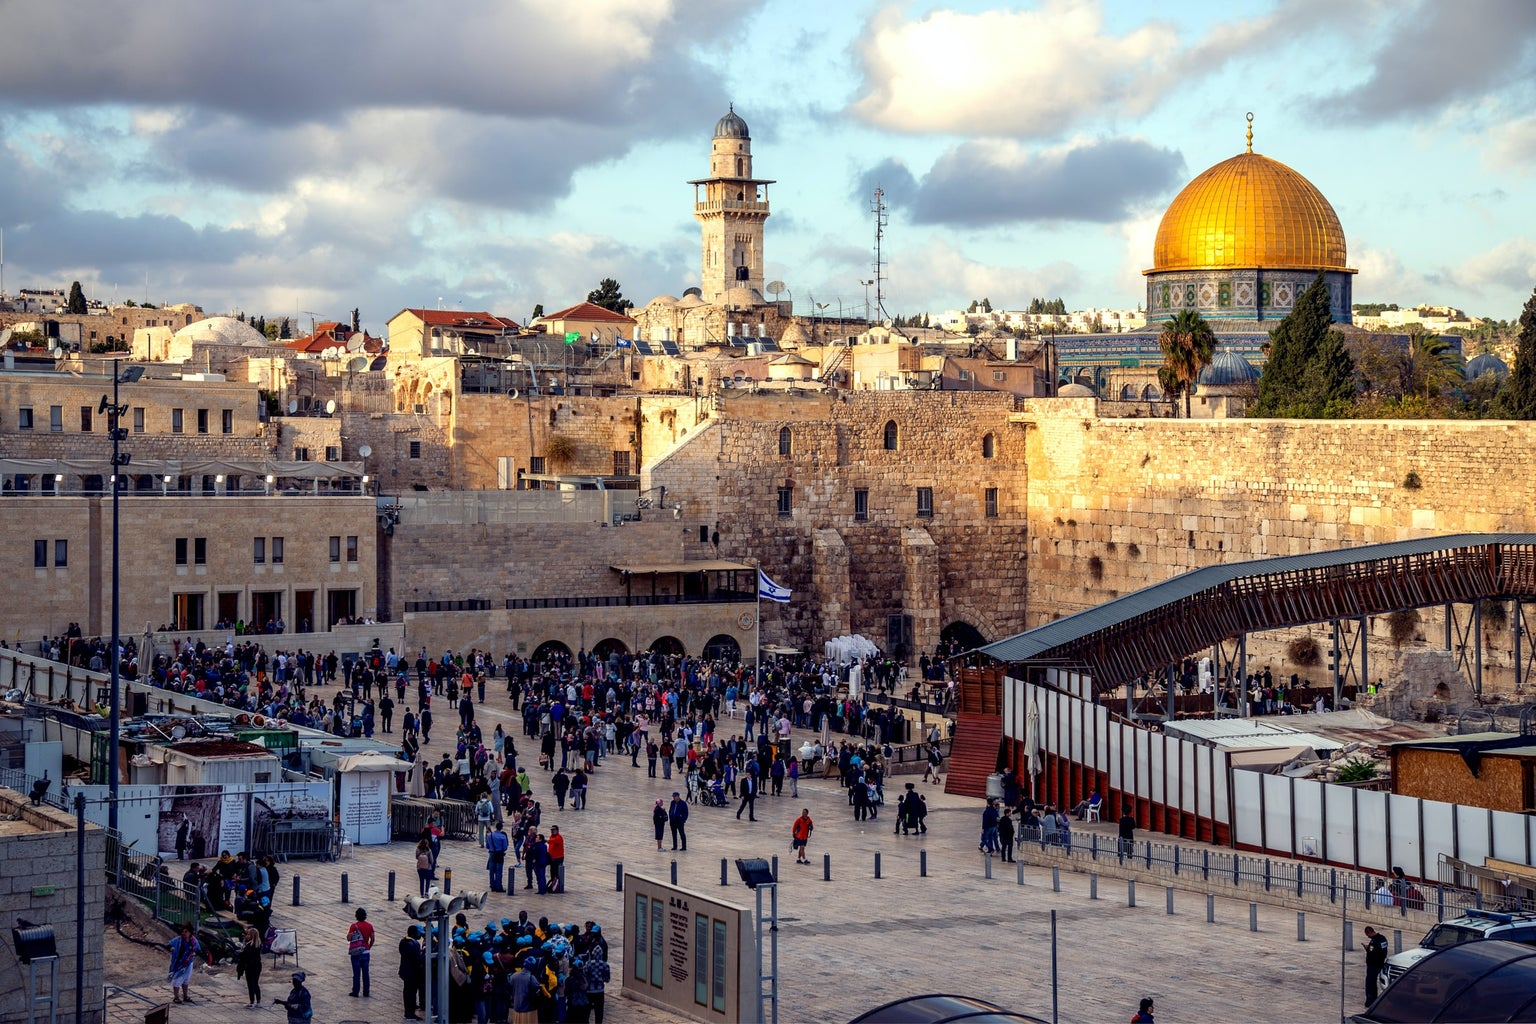 People gathered in the region of Western Wall, Jerusalem, Israel